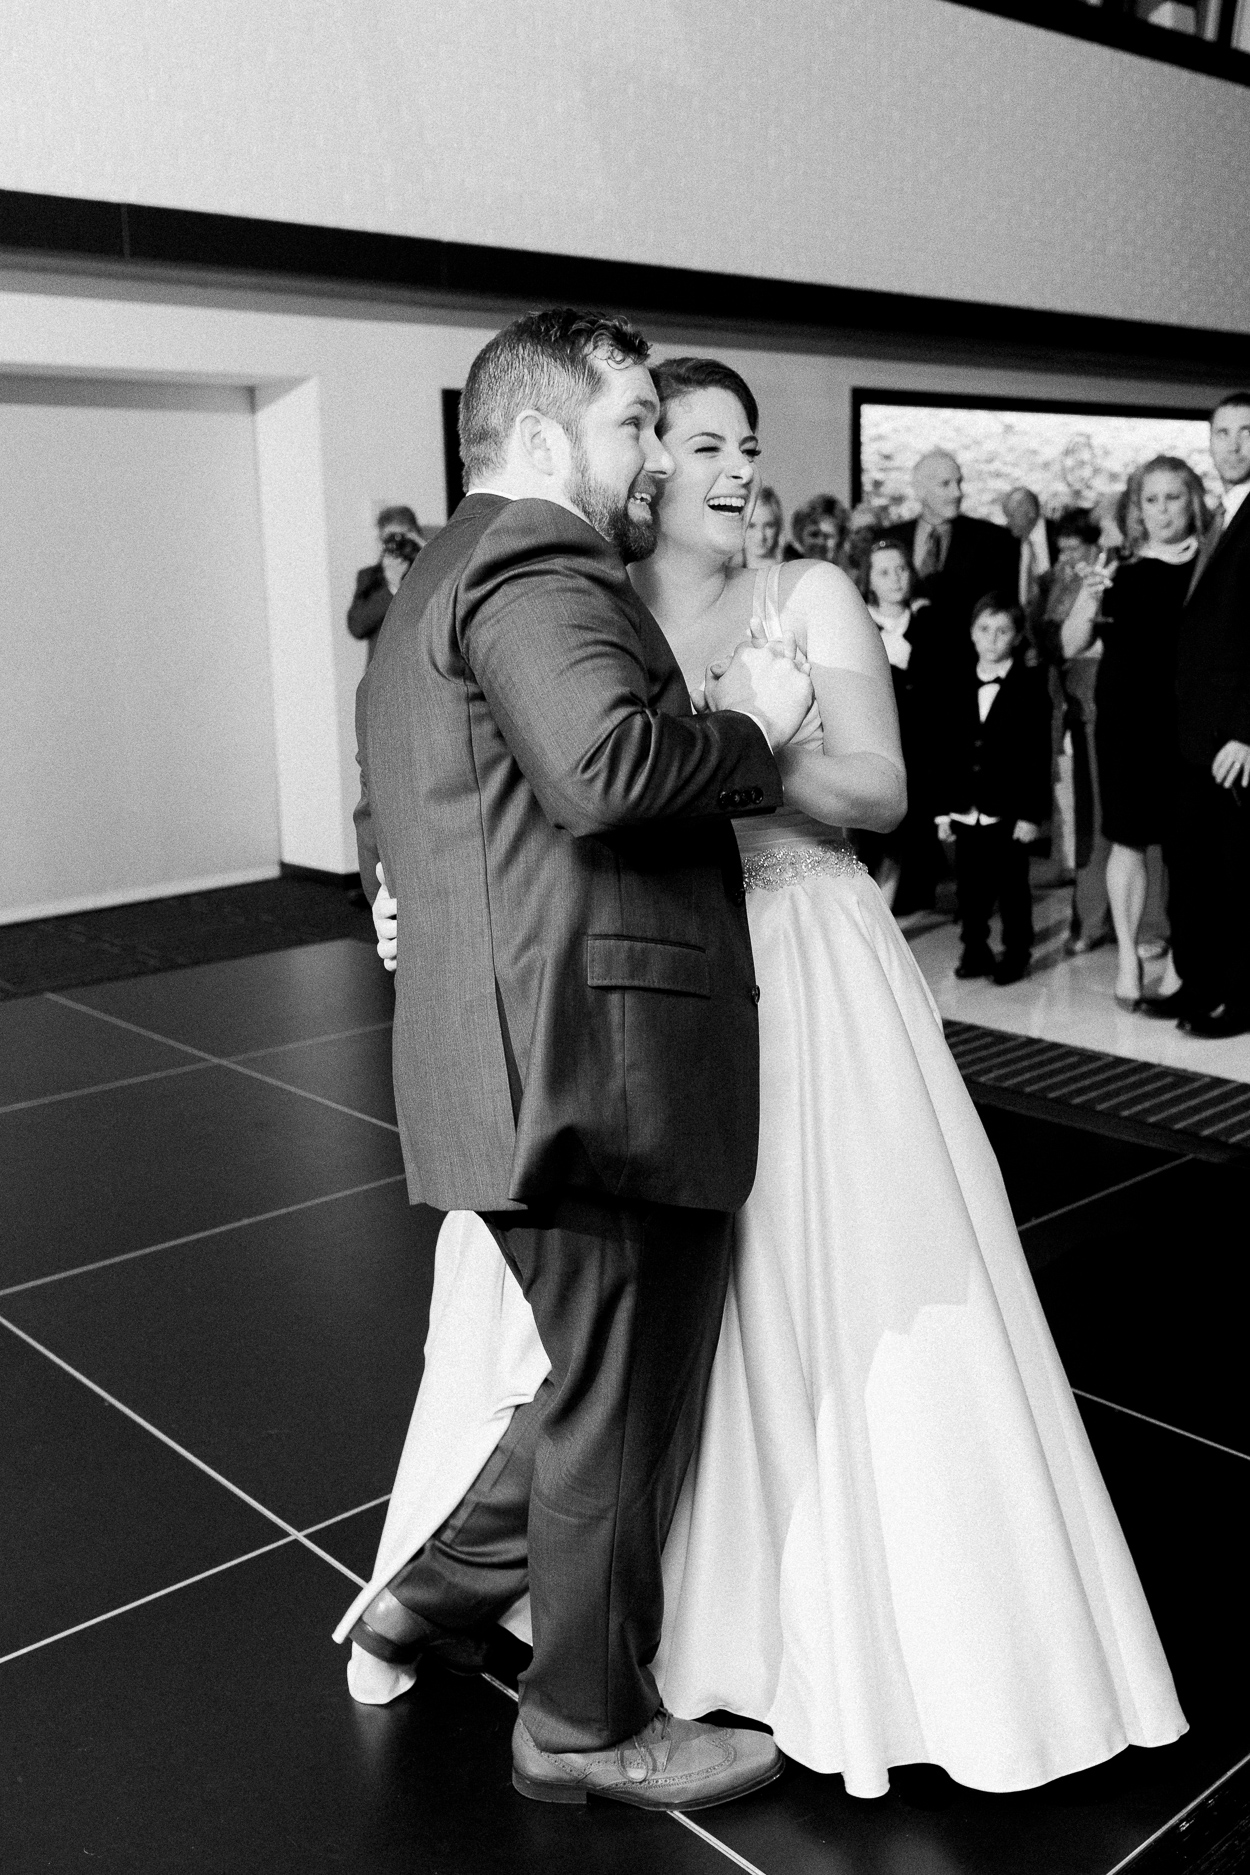 tower-club-wedding-reception-tysons-corner-photographer